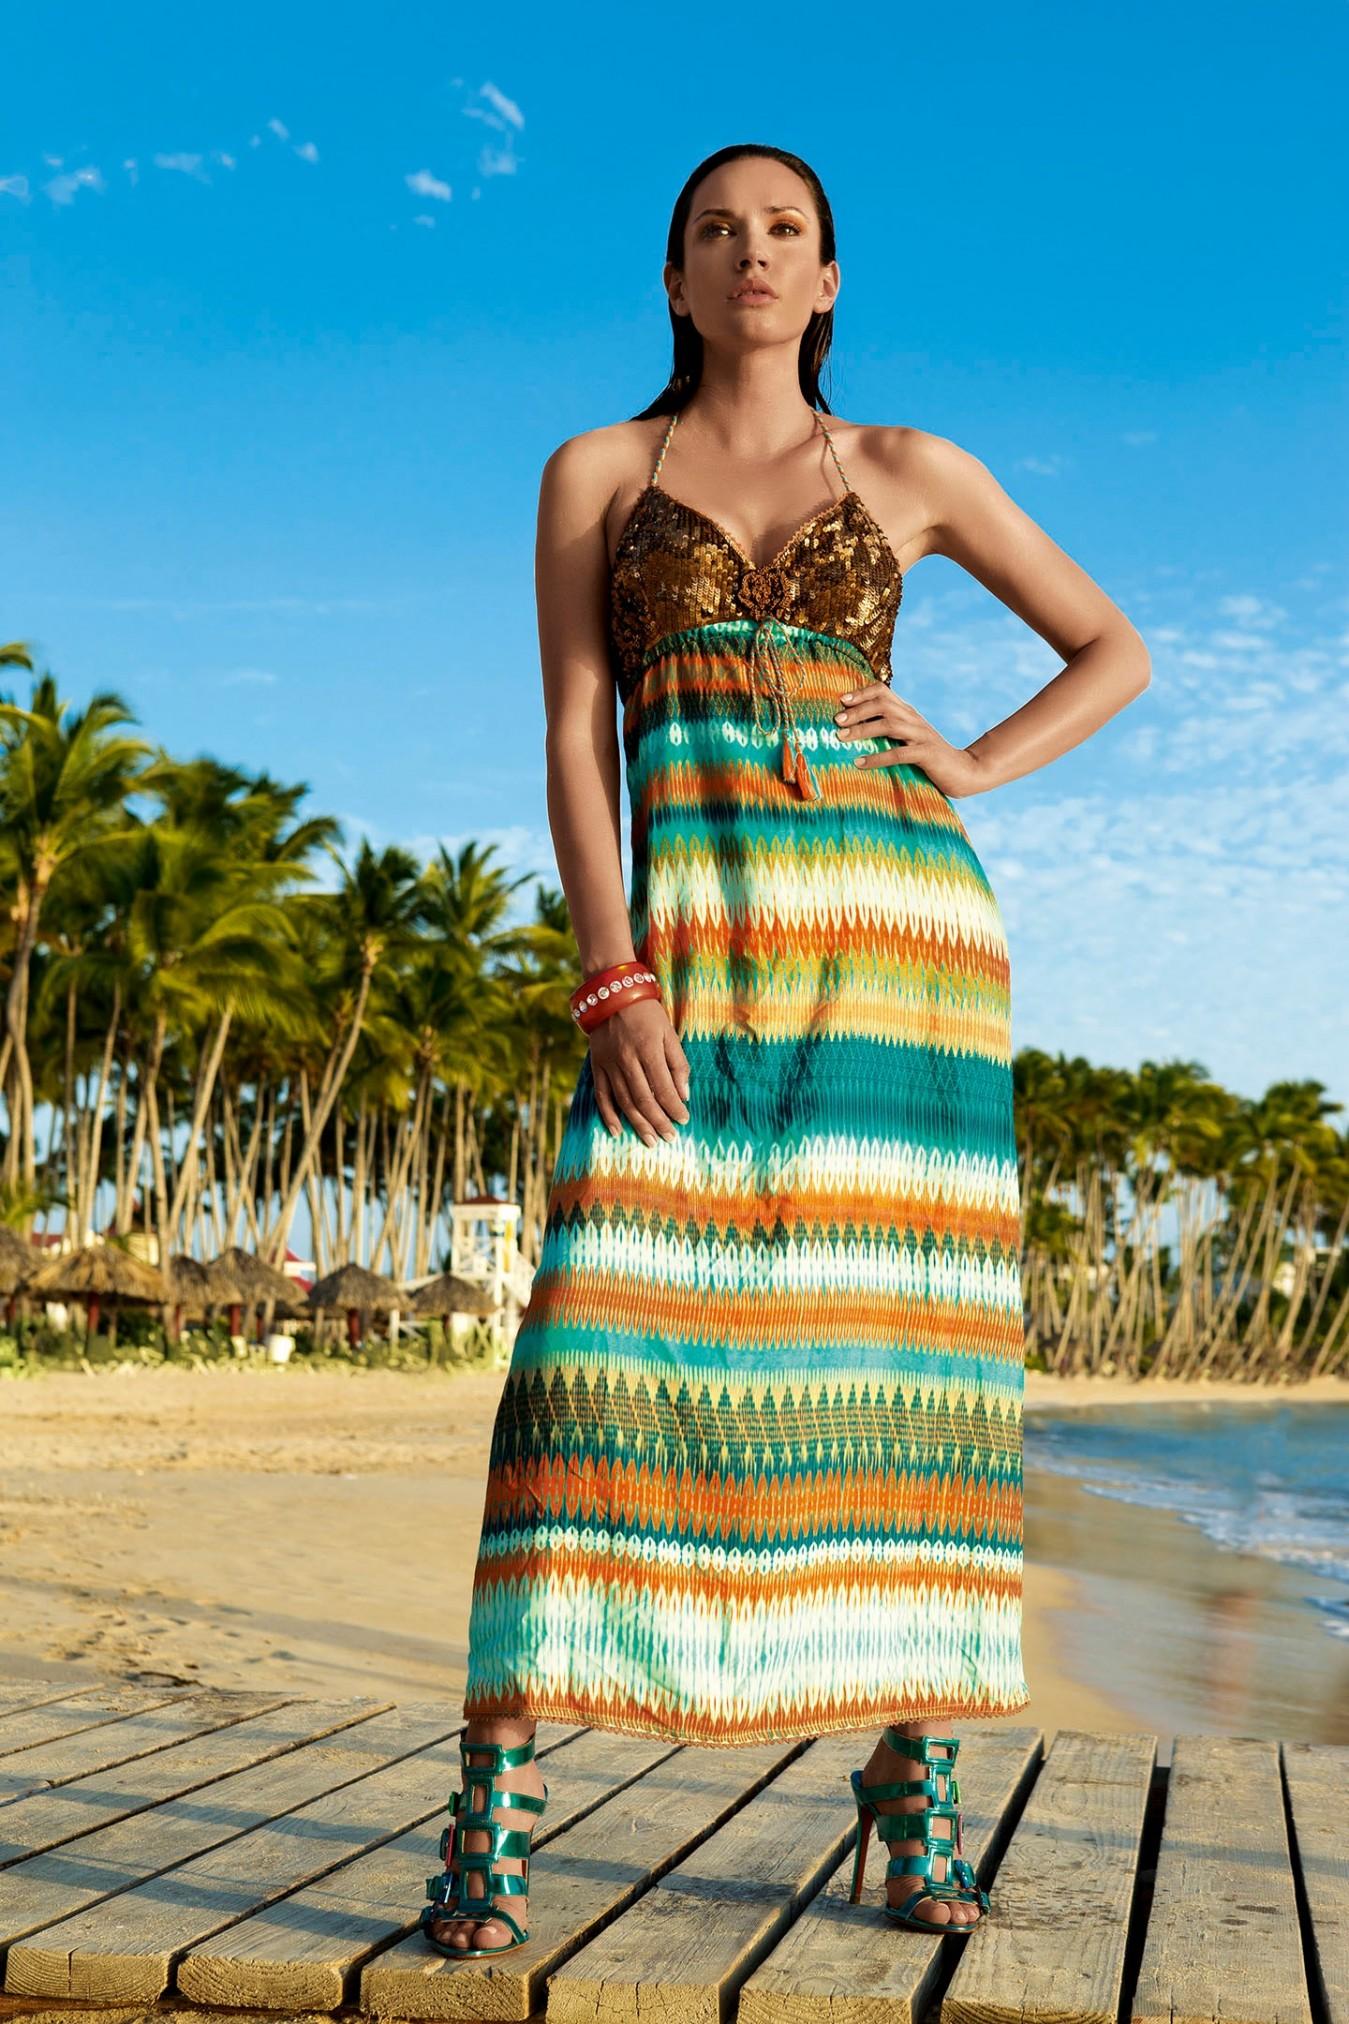 9606b1b452d Летний пляжный сарафан для девушек Vacanze Italiane VE 6032 - фото №1